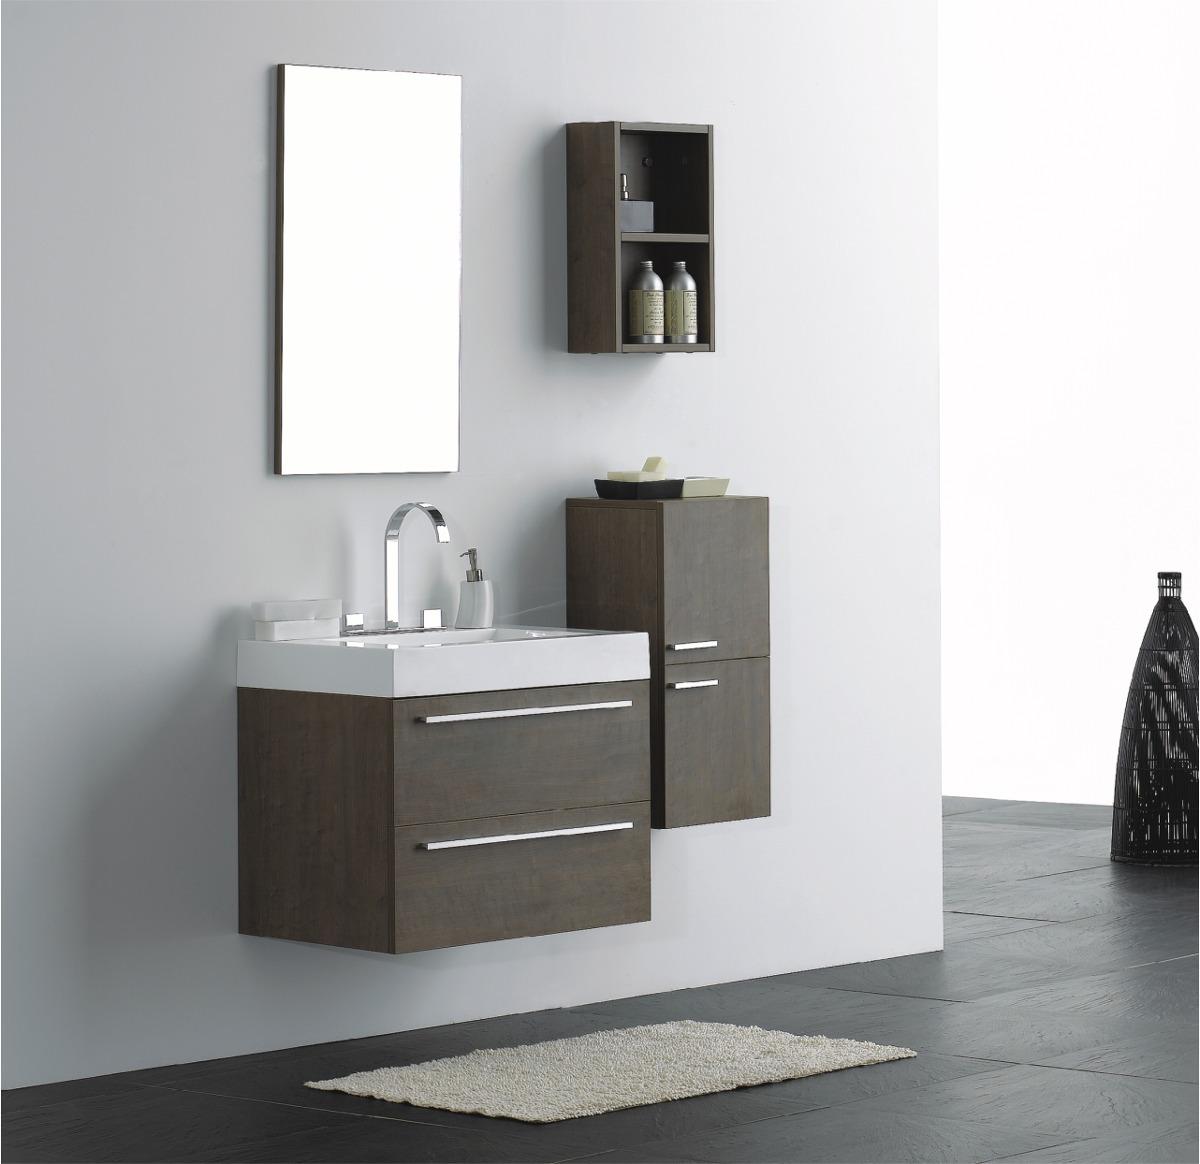 Kit Gabinete Banheiro Modelo Dafne Kd695 05 Peças